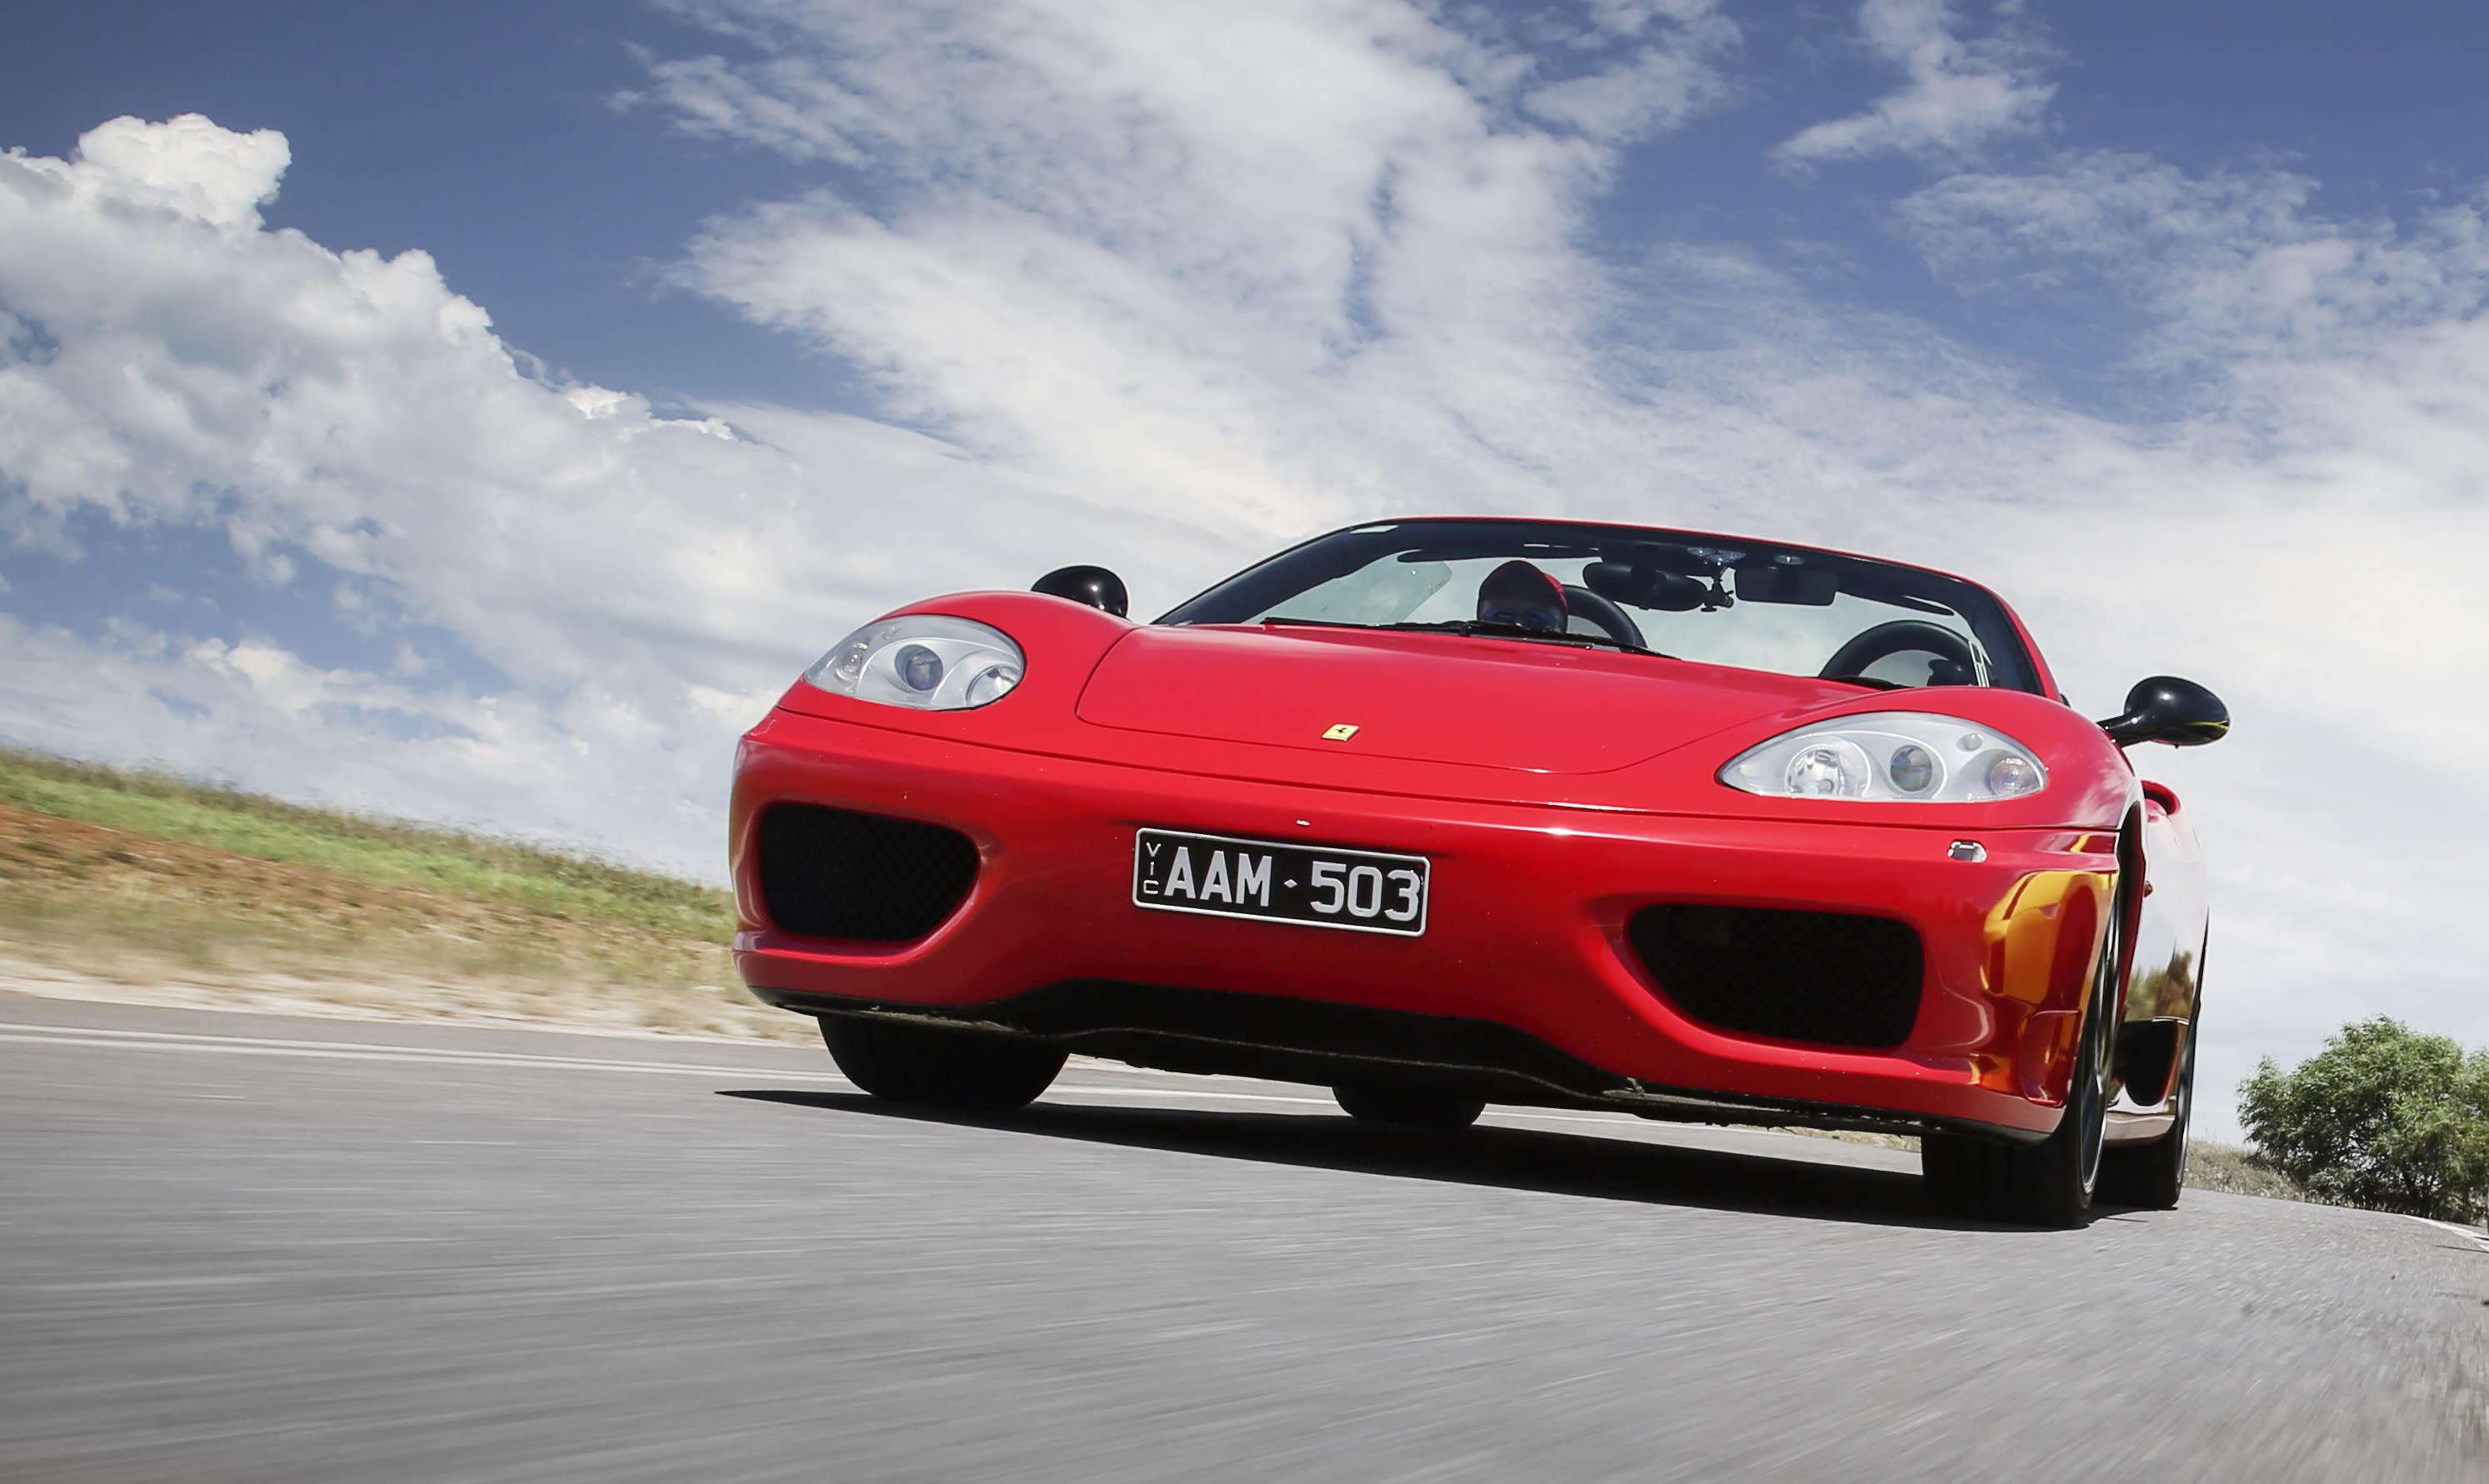 Drive a Ferrari, 30 Minutes - Mornington Peninsula